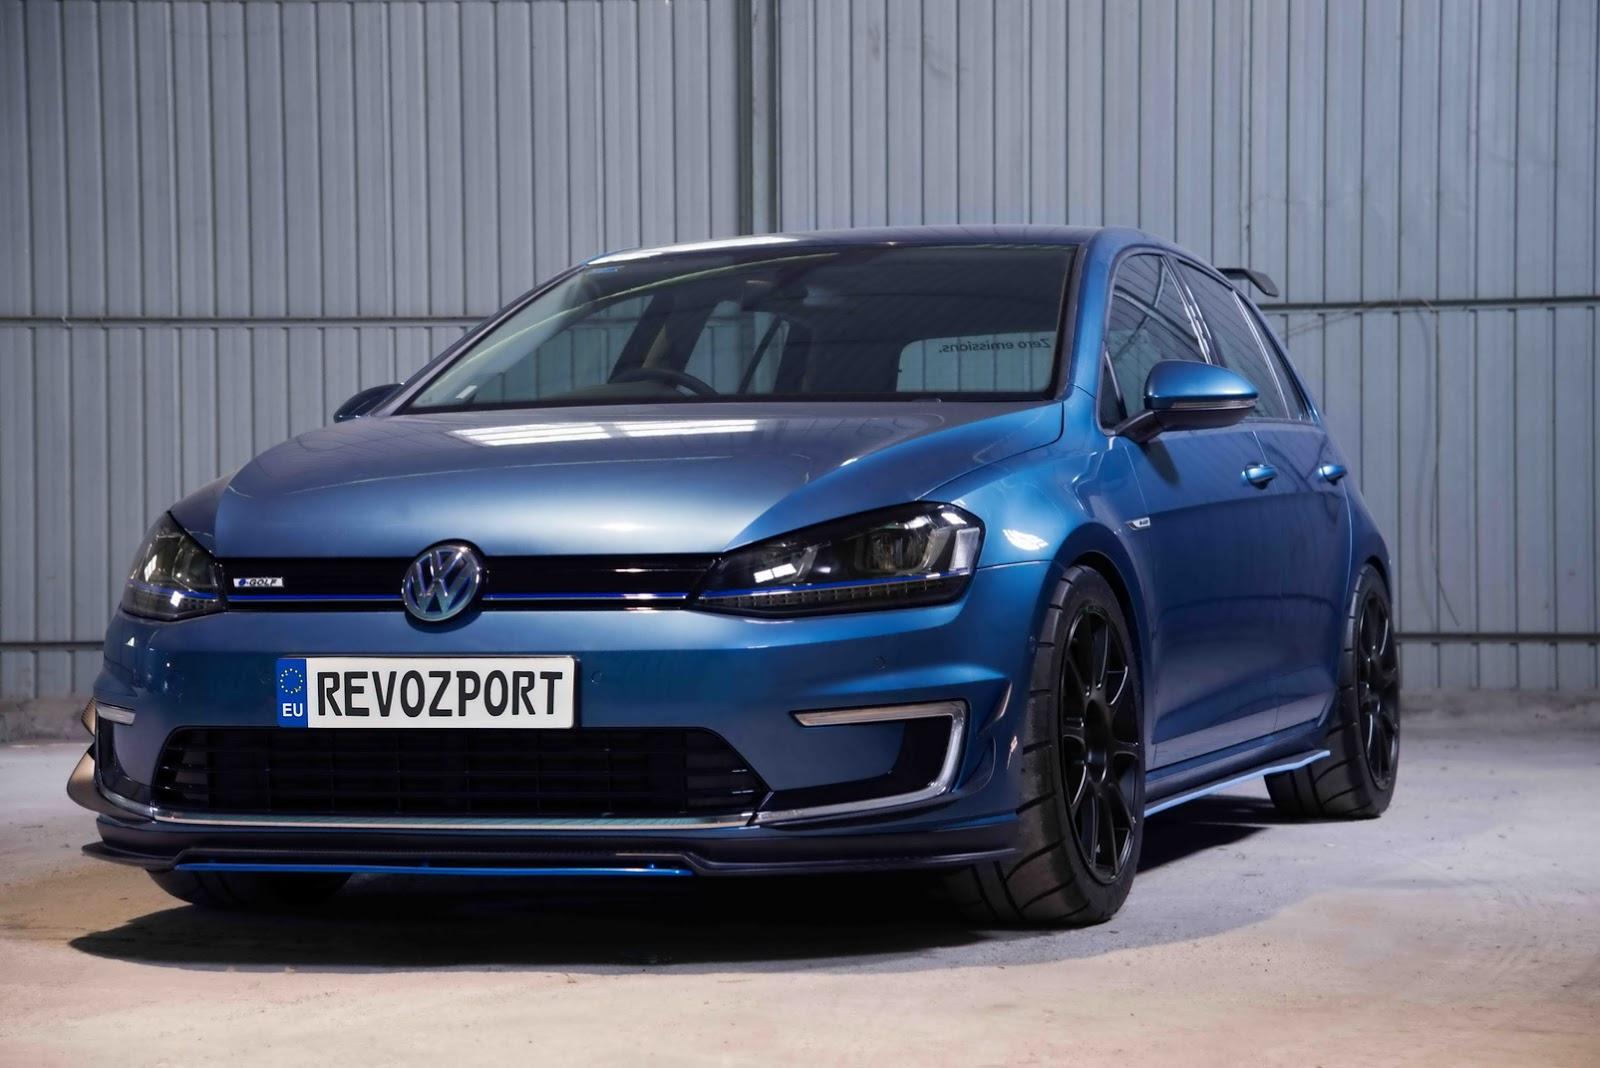 Volkswagen_e-Golf_Razor_7E_by_RevoZport_18